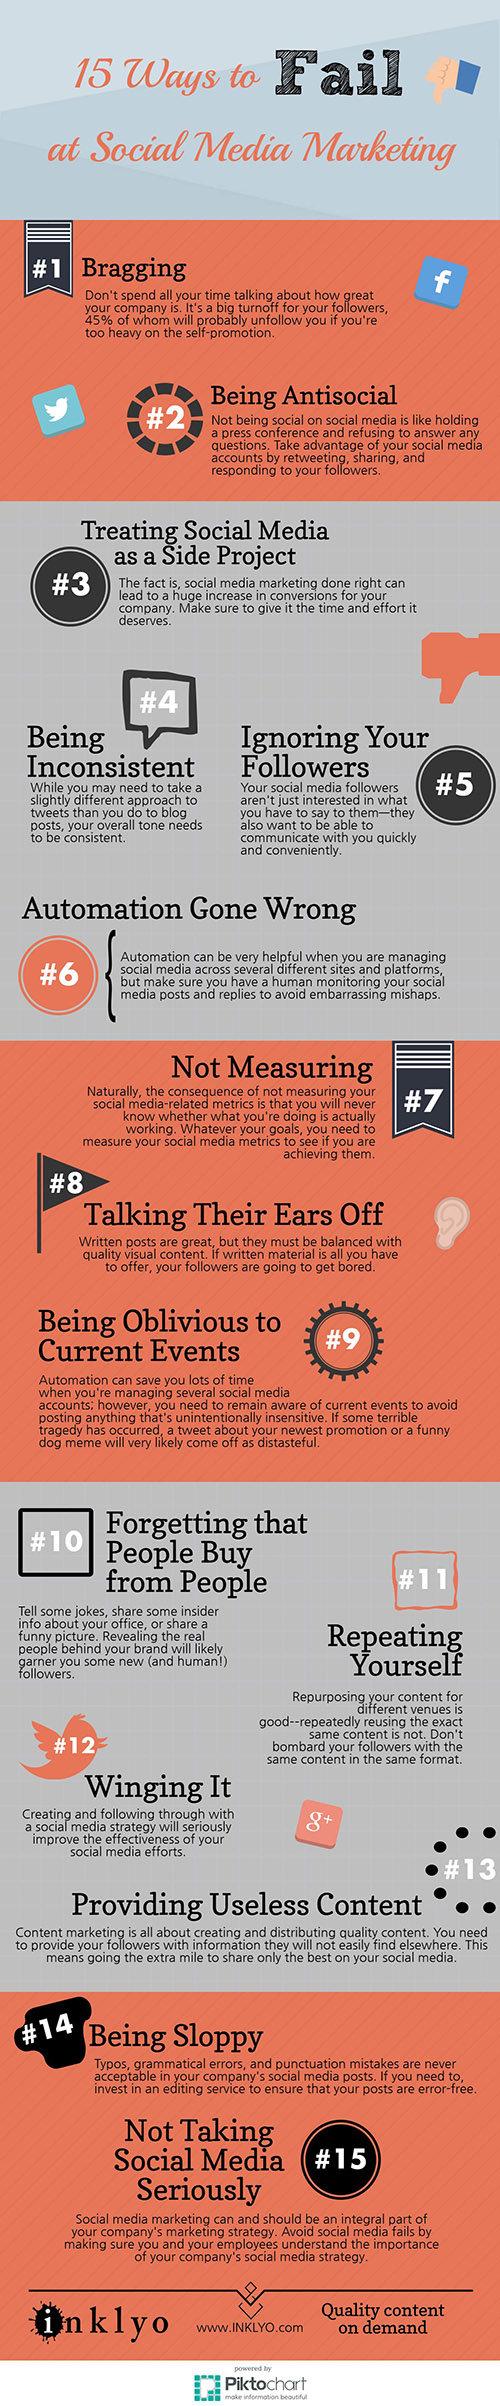 Fifteen ways to fail at #Social_Media #Marketing #SMM #Infographic